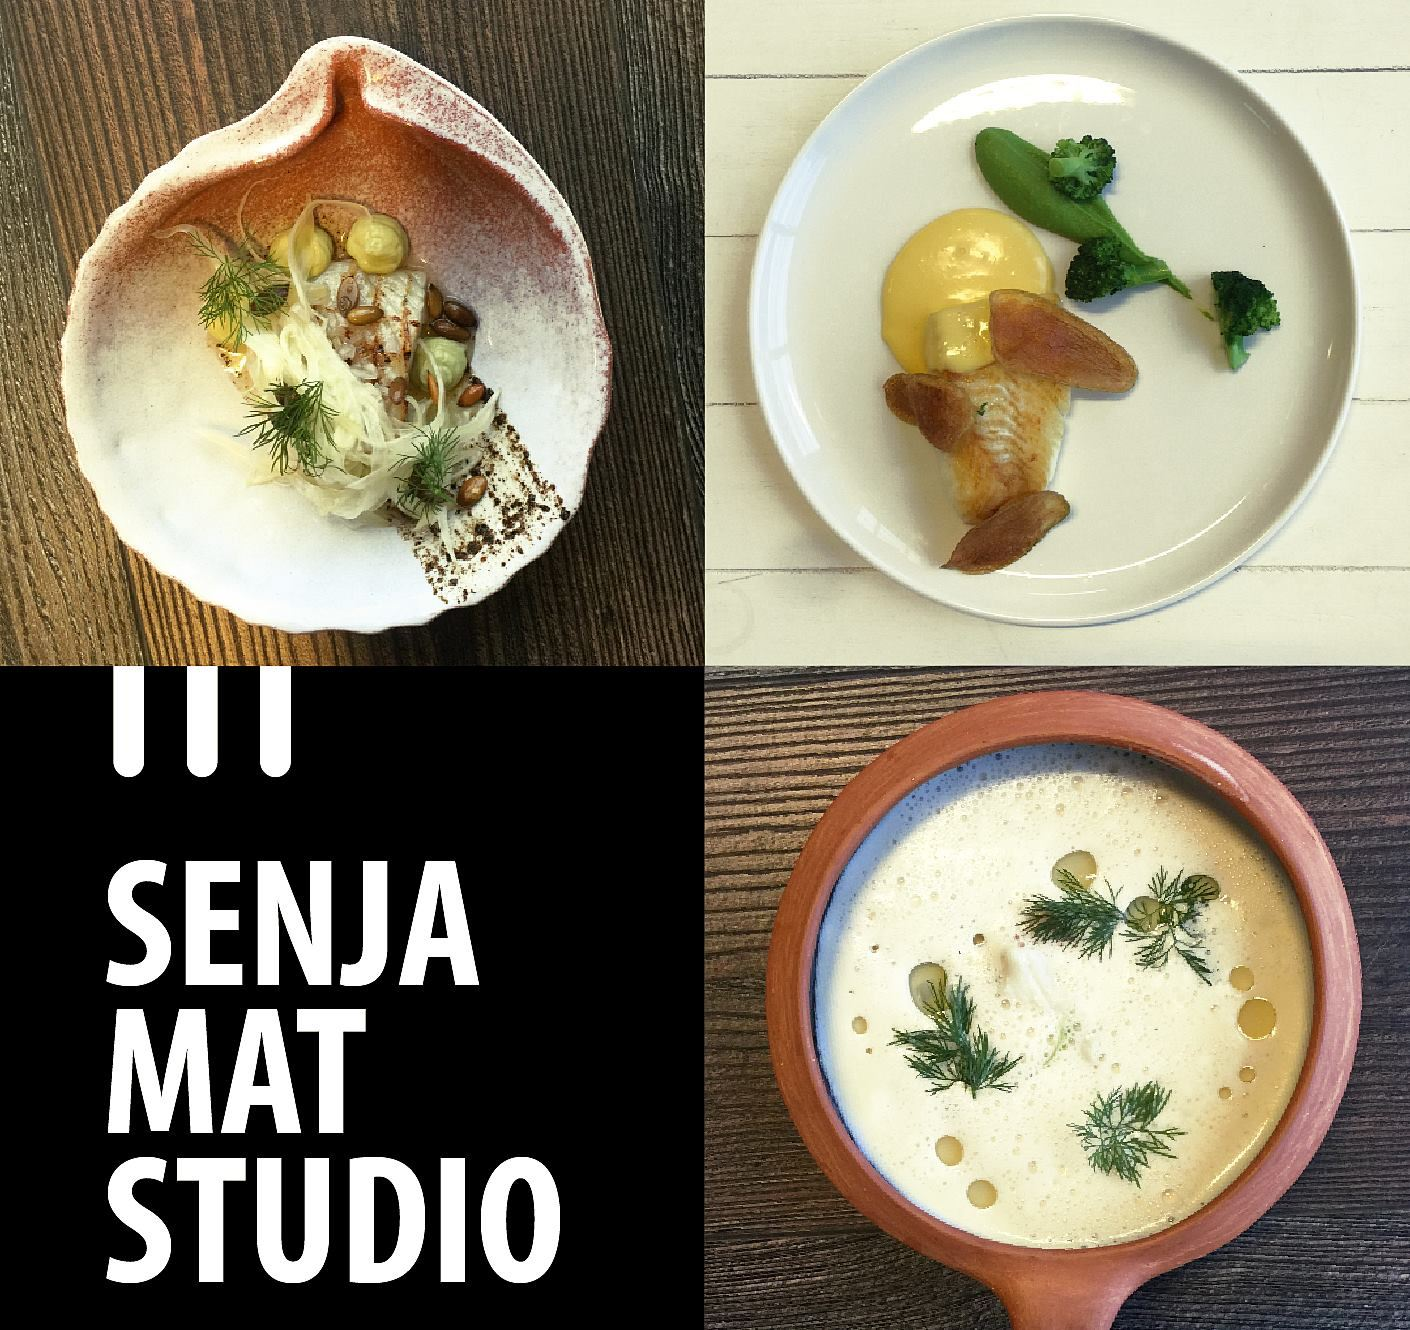 www.impulsfoto.no, Senja Matstudio